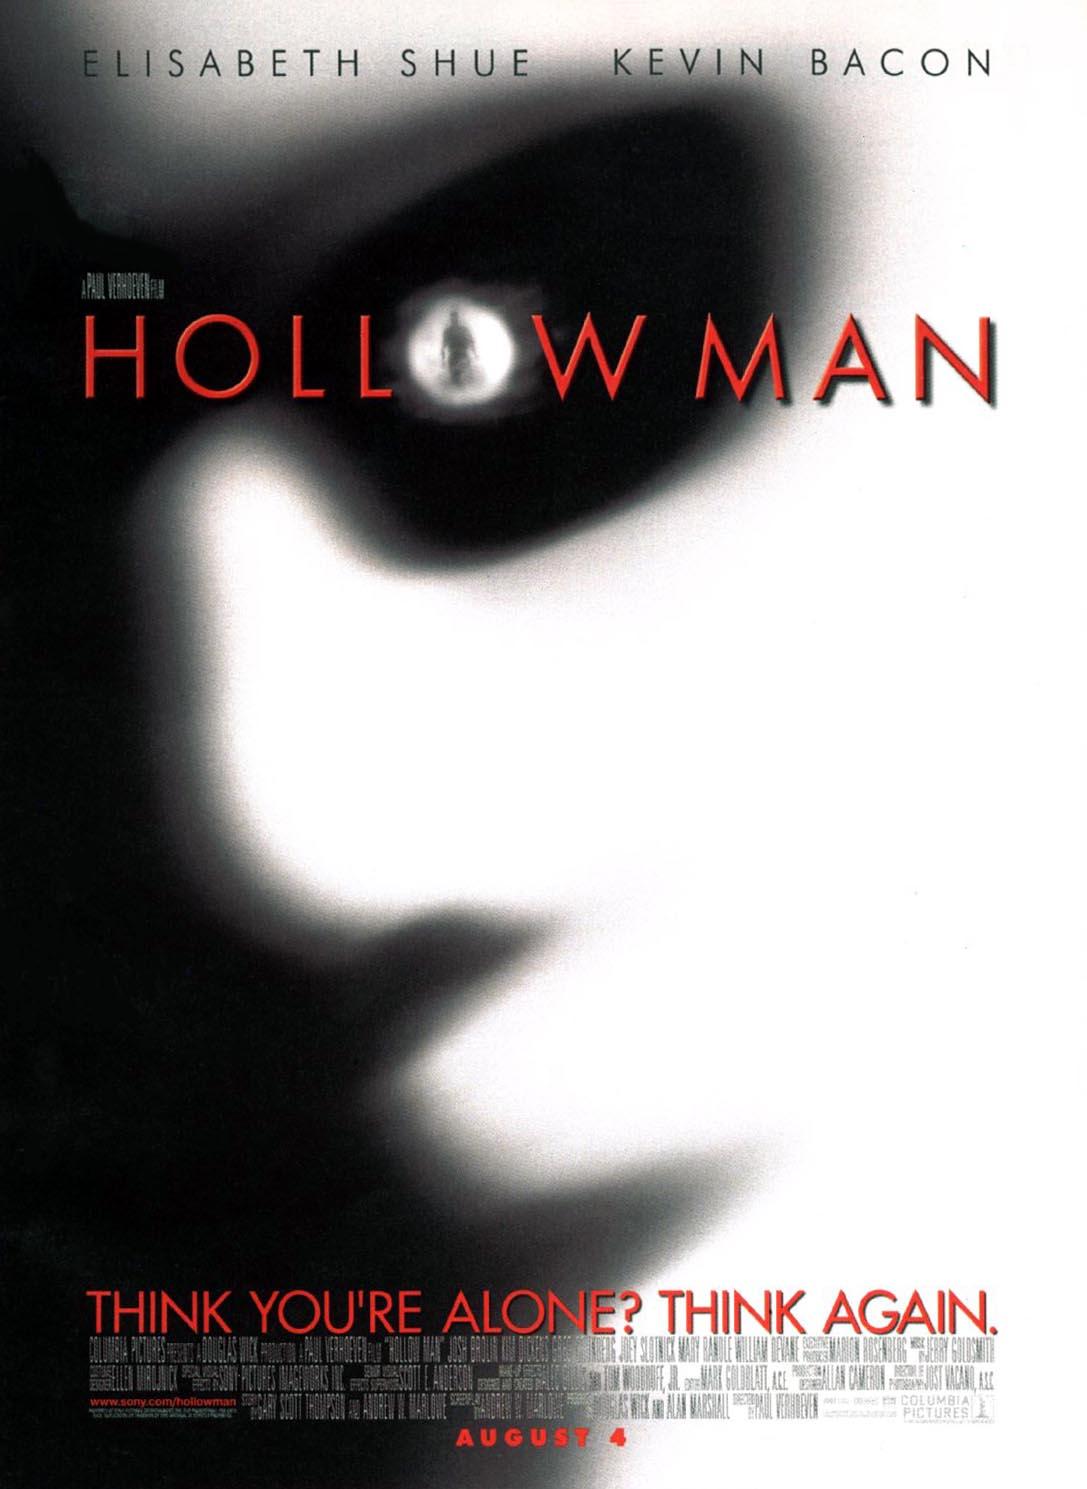 Happyotter: HOLLOW MAN (2000)